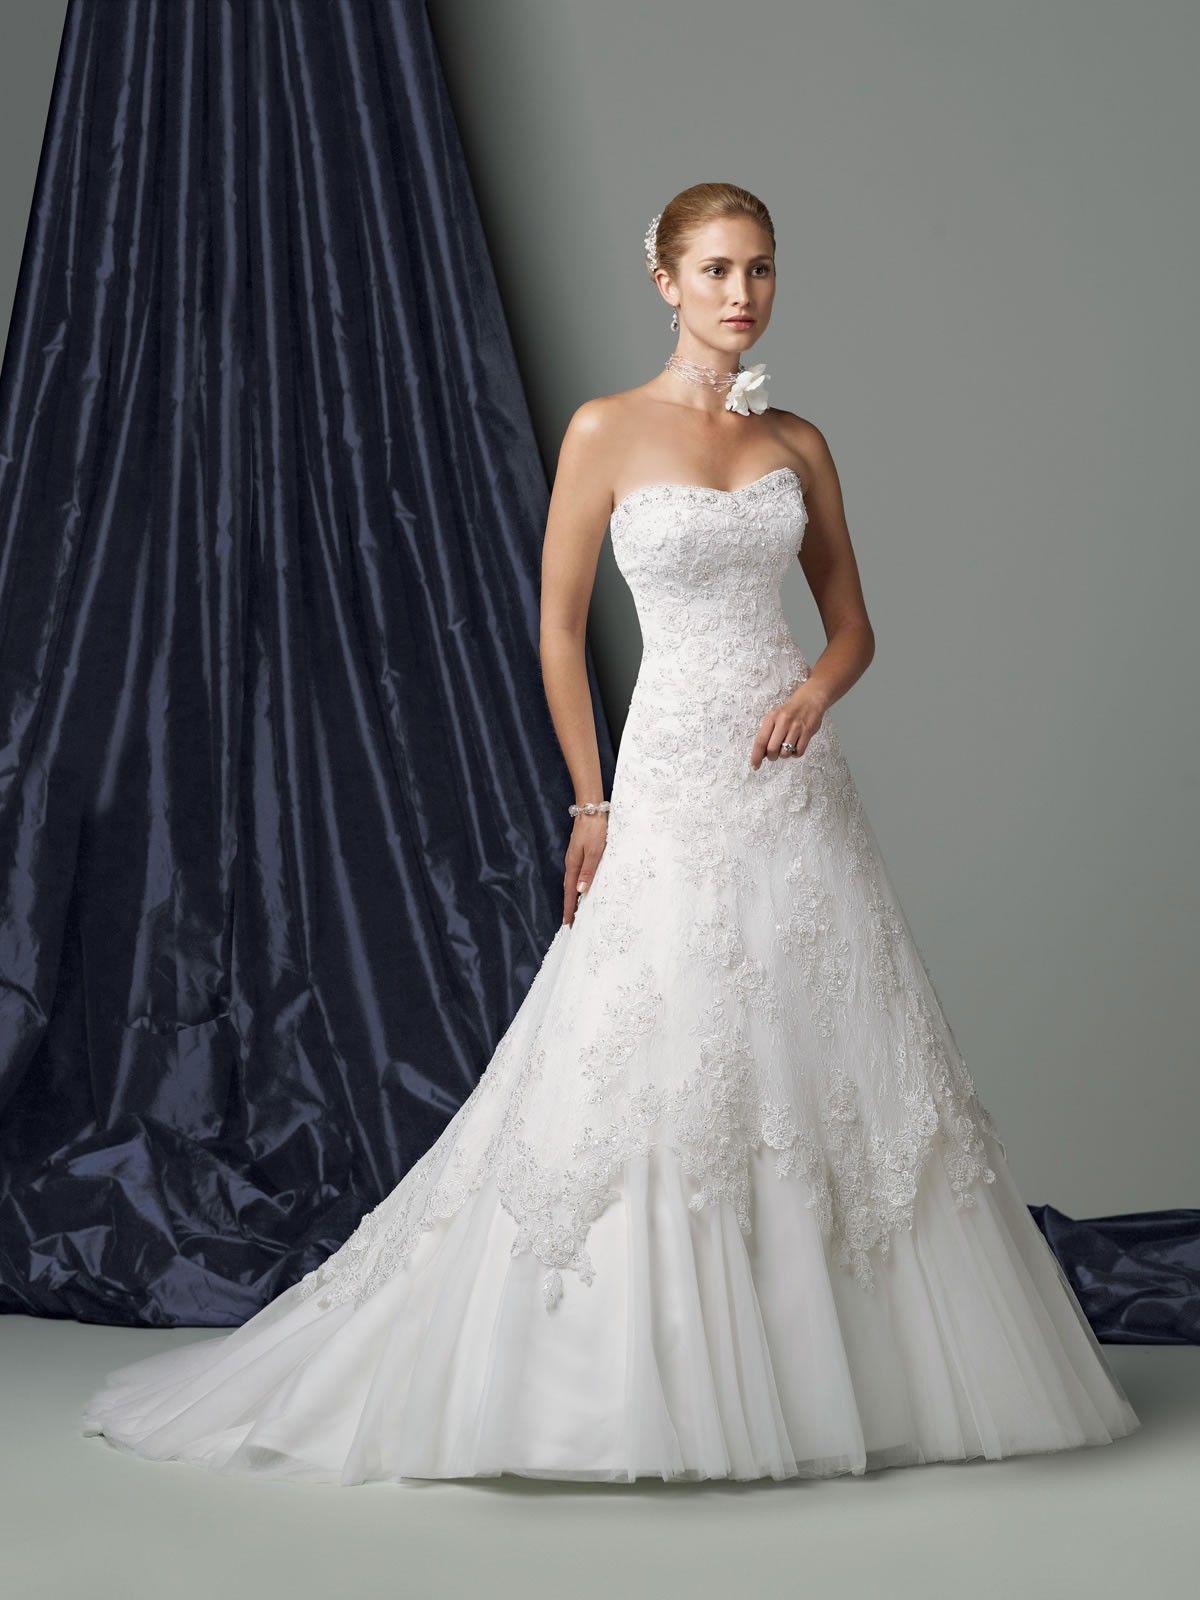 Organza Softly Curved Neckline Low Dipped Back Bodice Aline Wedding